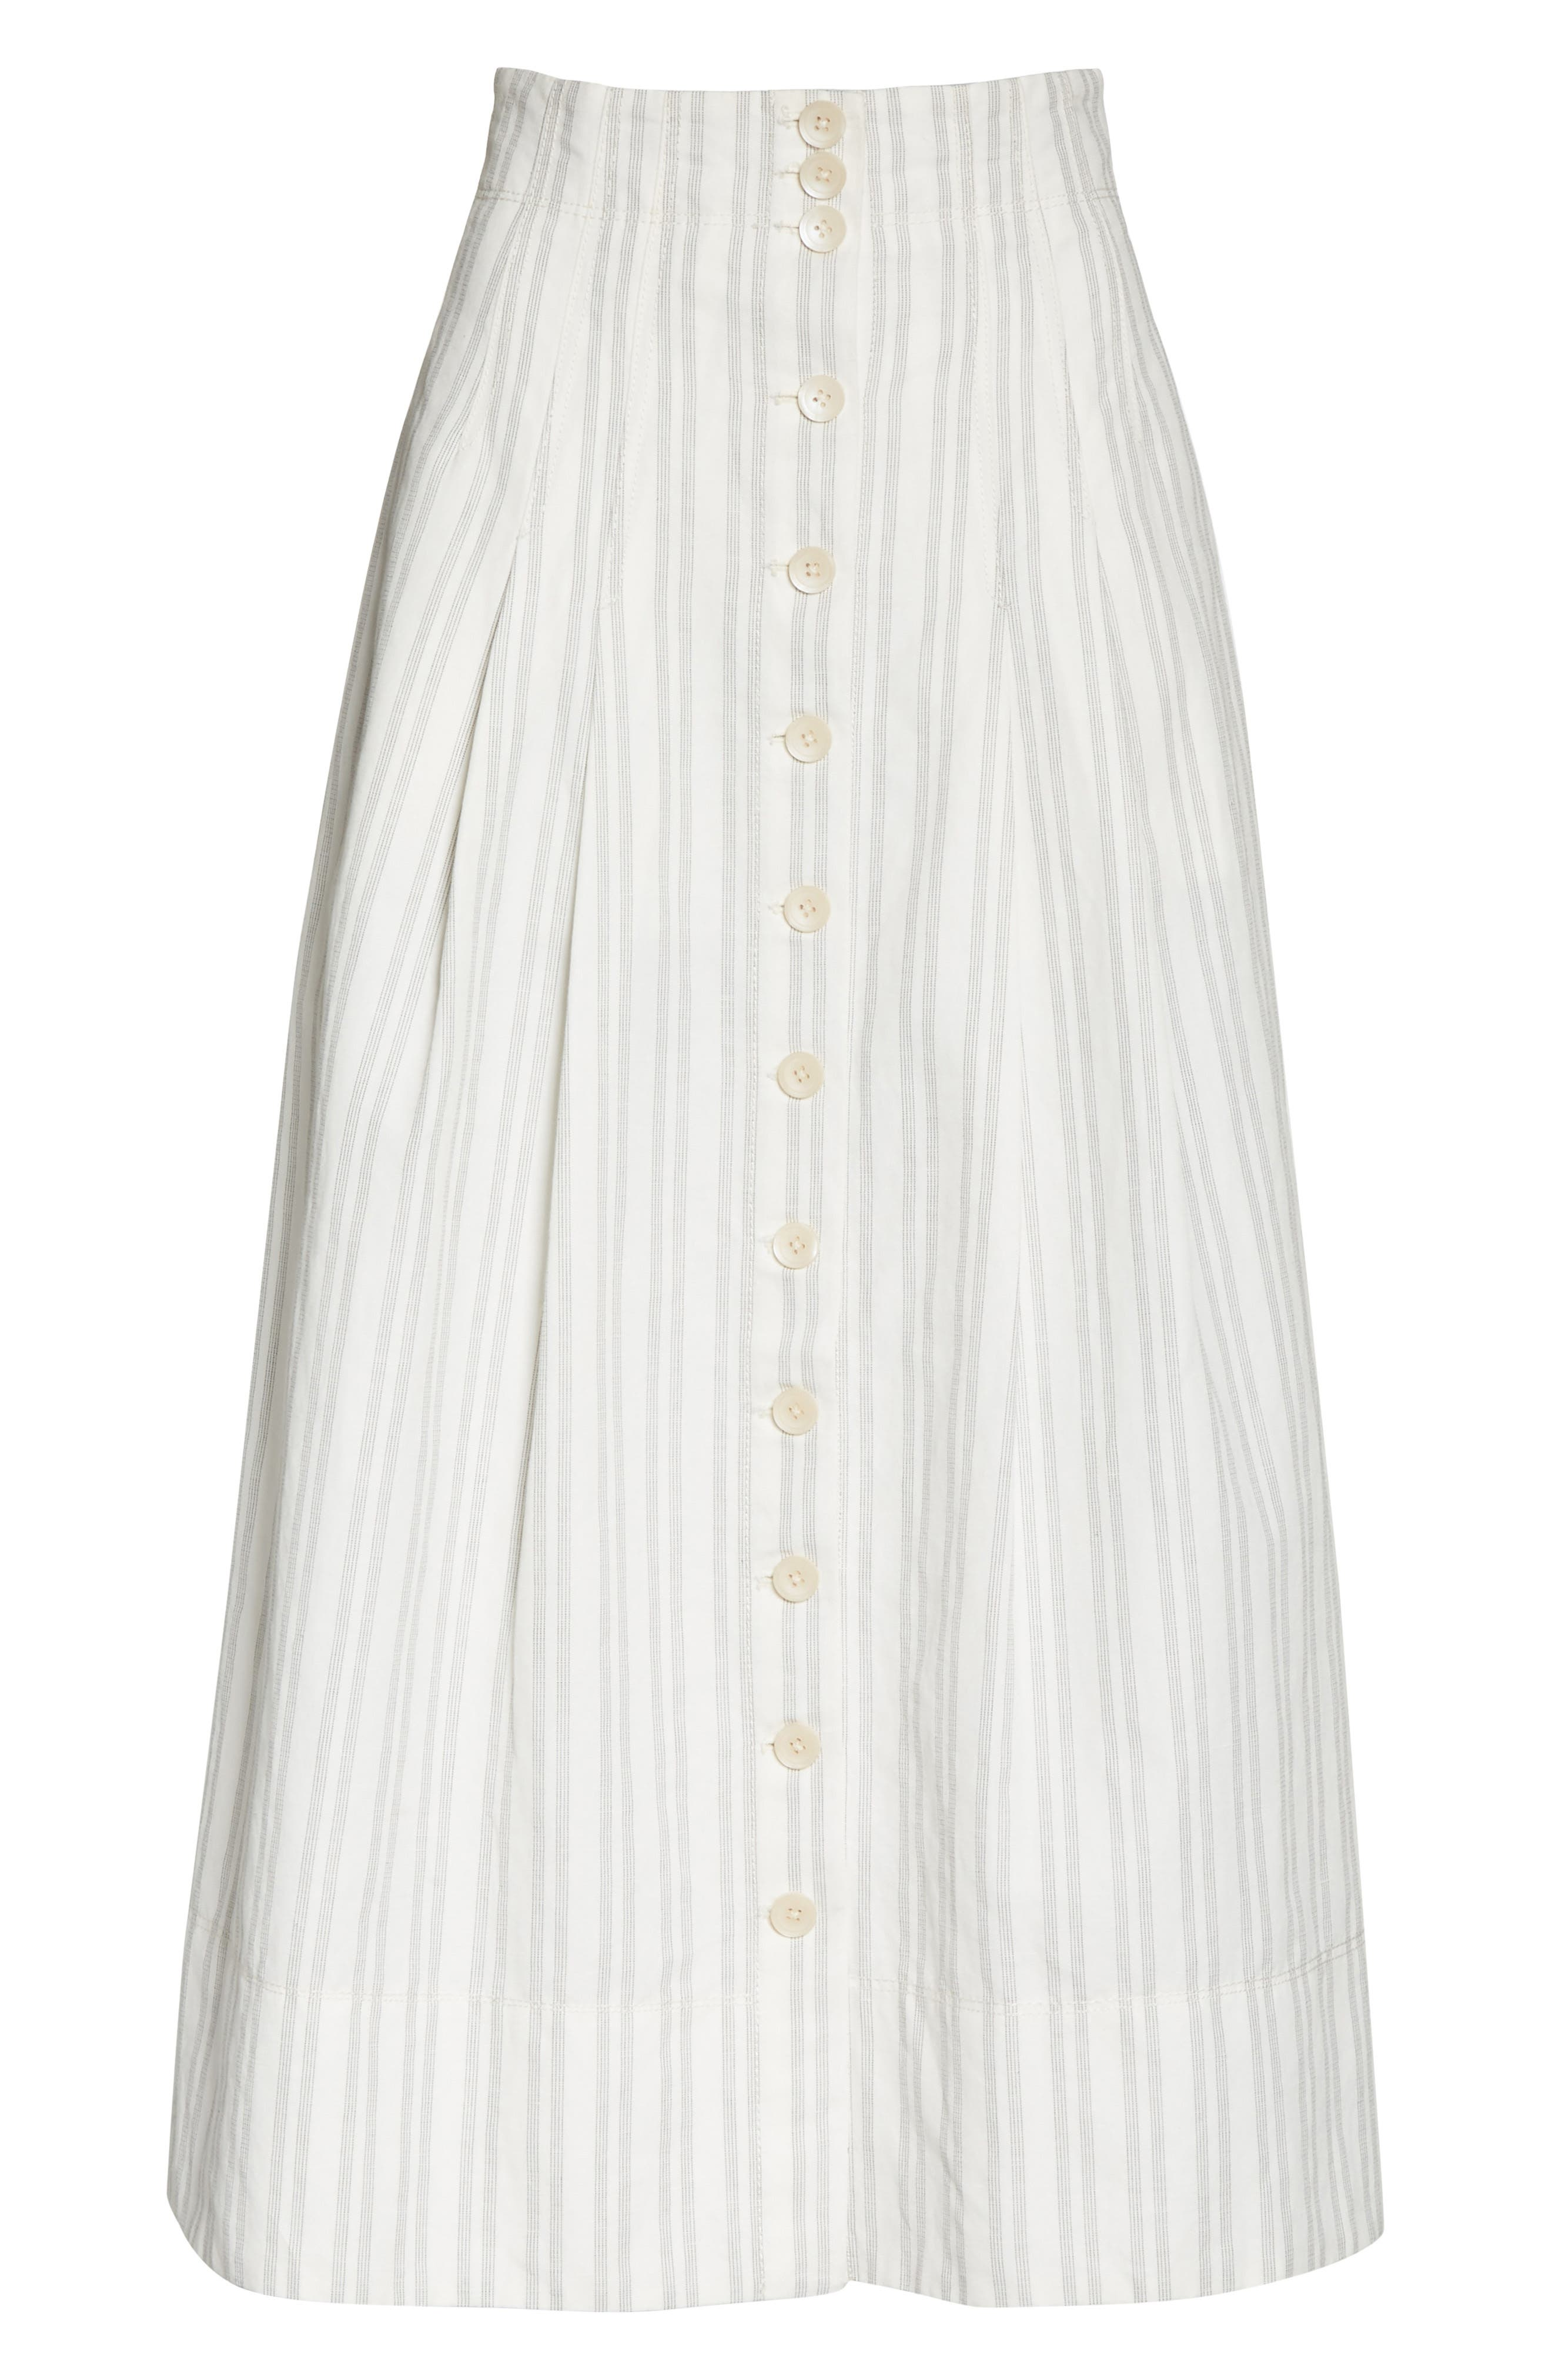 Stripe Midi Skirt,                             Alternate thumbnail 6, color,                             Snow/ Black